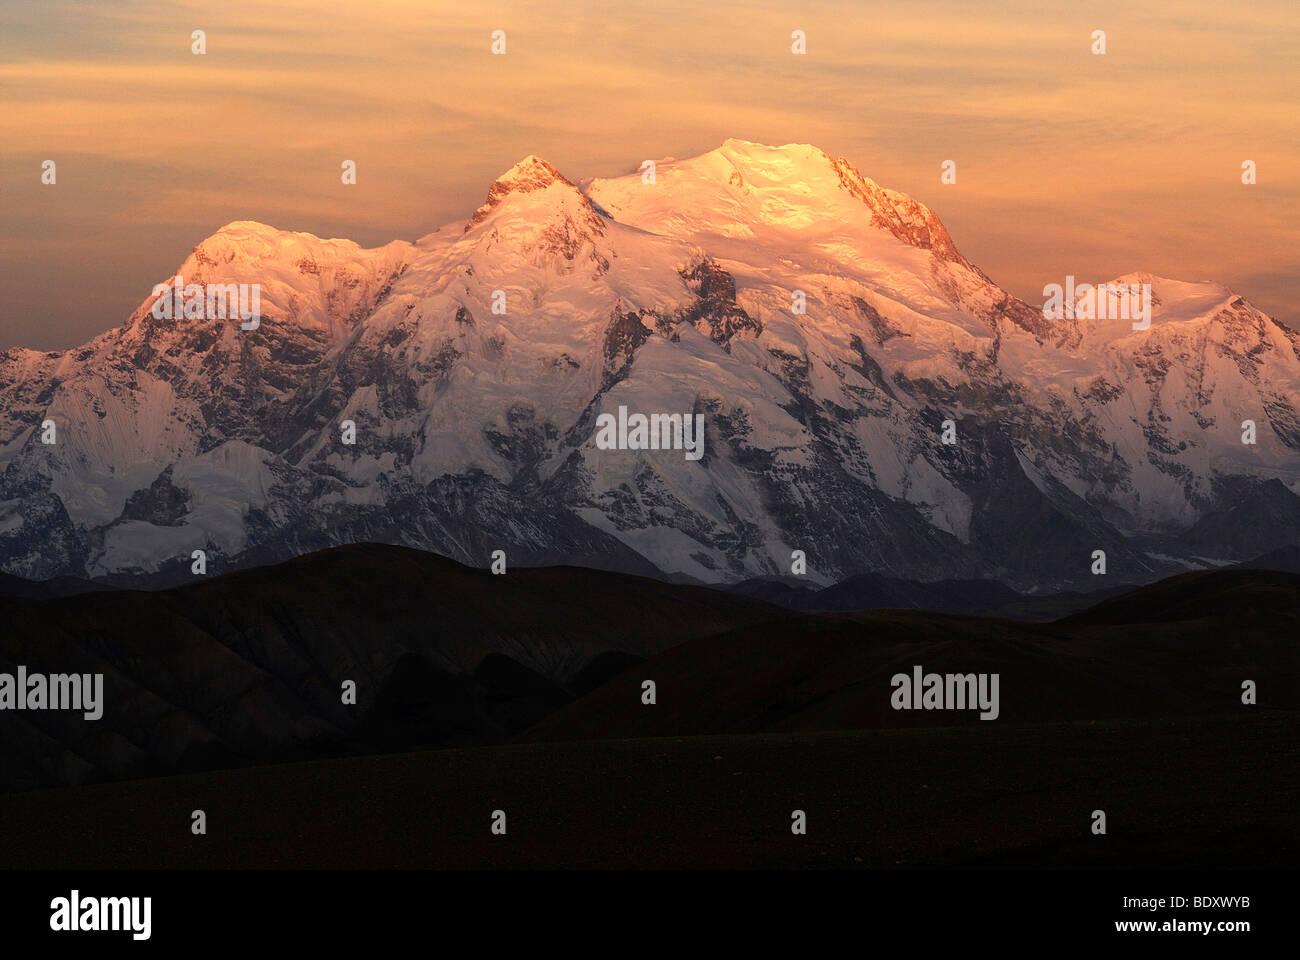 Shishapangma 'place of the saints' with 8027m altitude at sunrise, Tibet, China, Asia - Stock Image